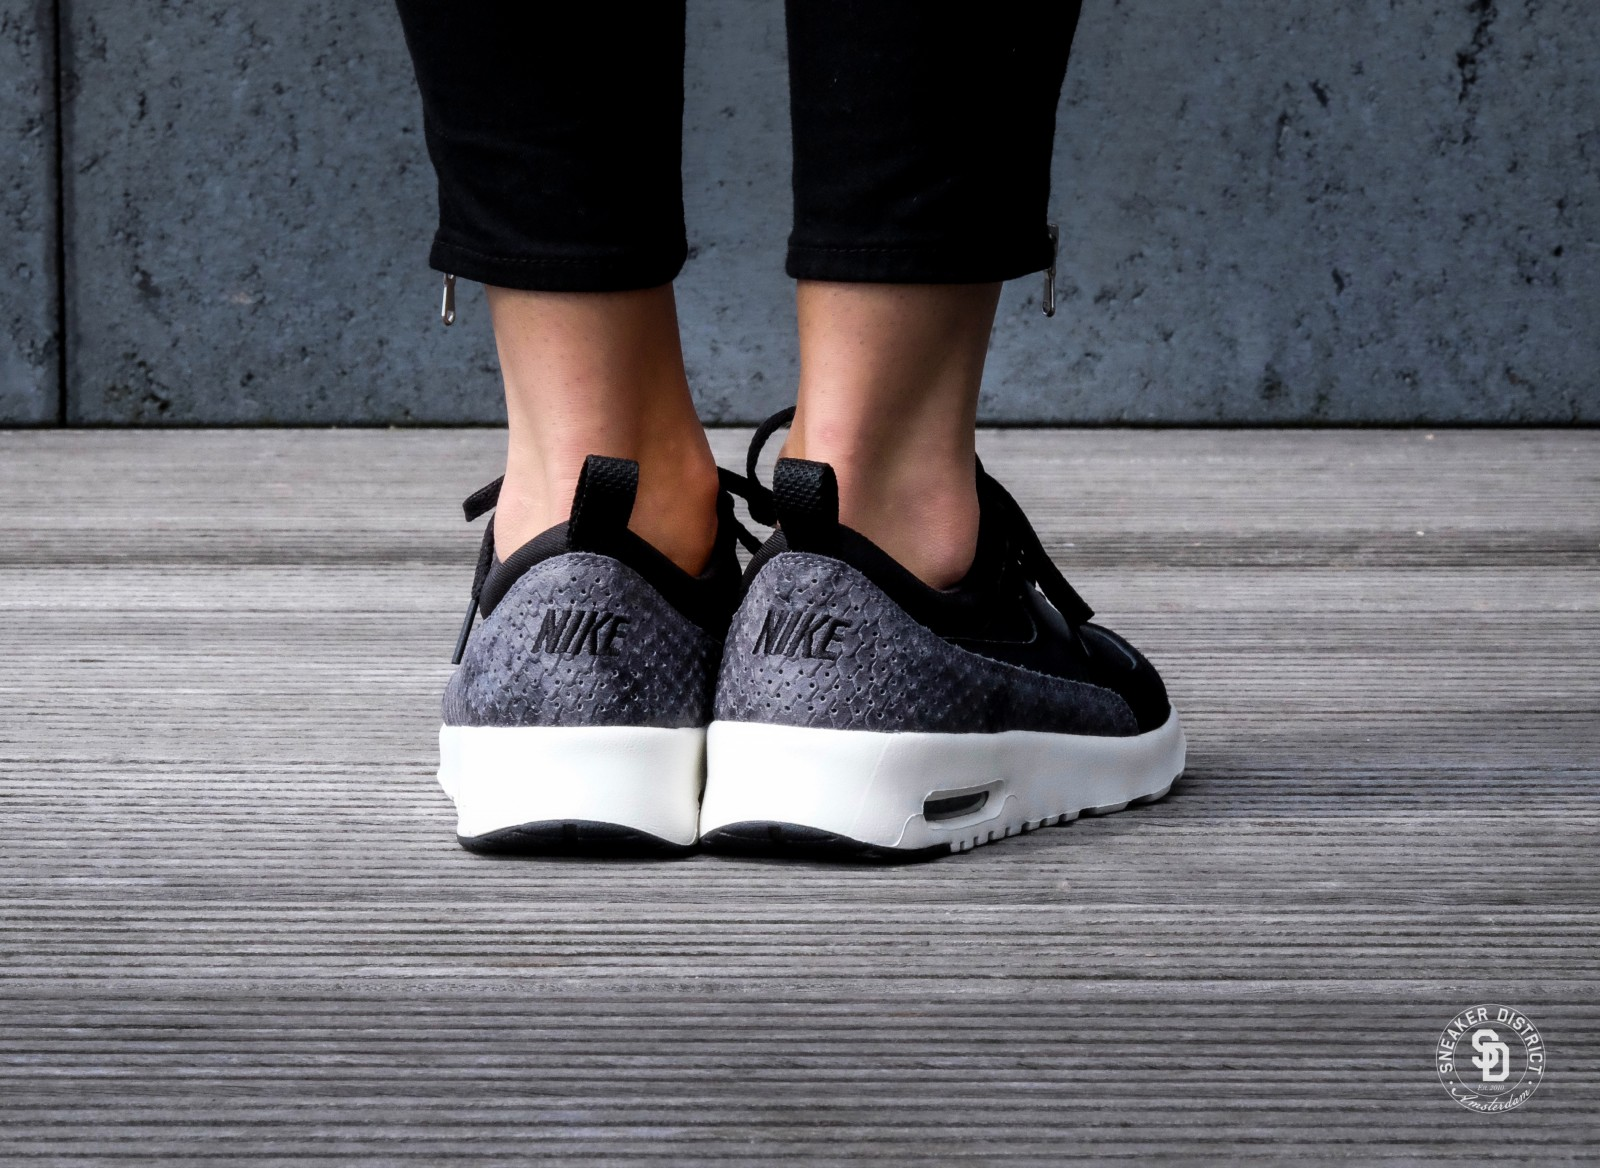 Nike WMNS Air Max Thea PRM BlackSail Dark Grey 616723 019